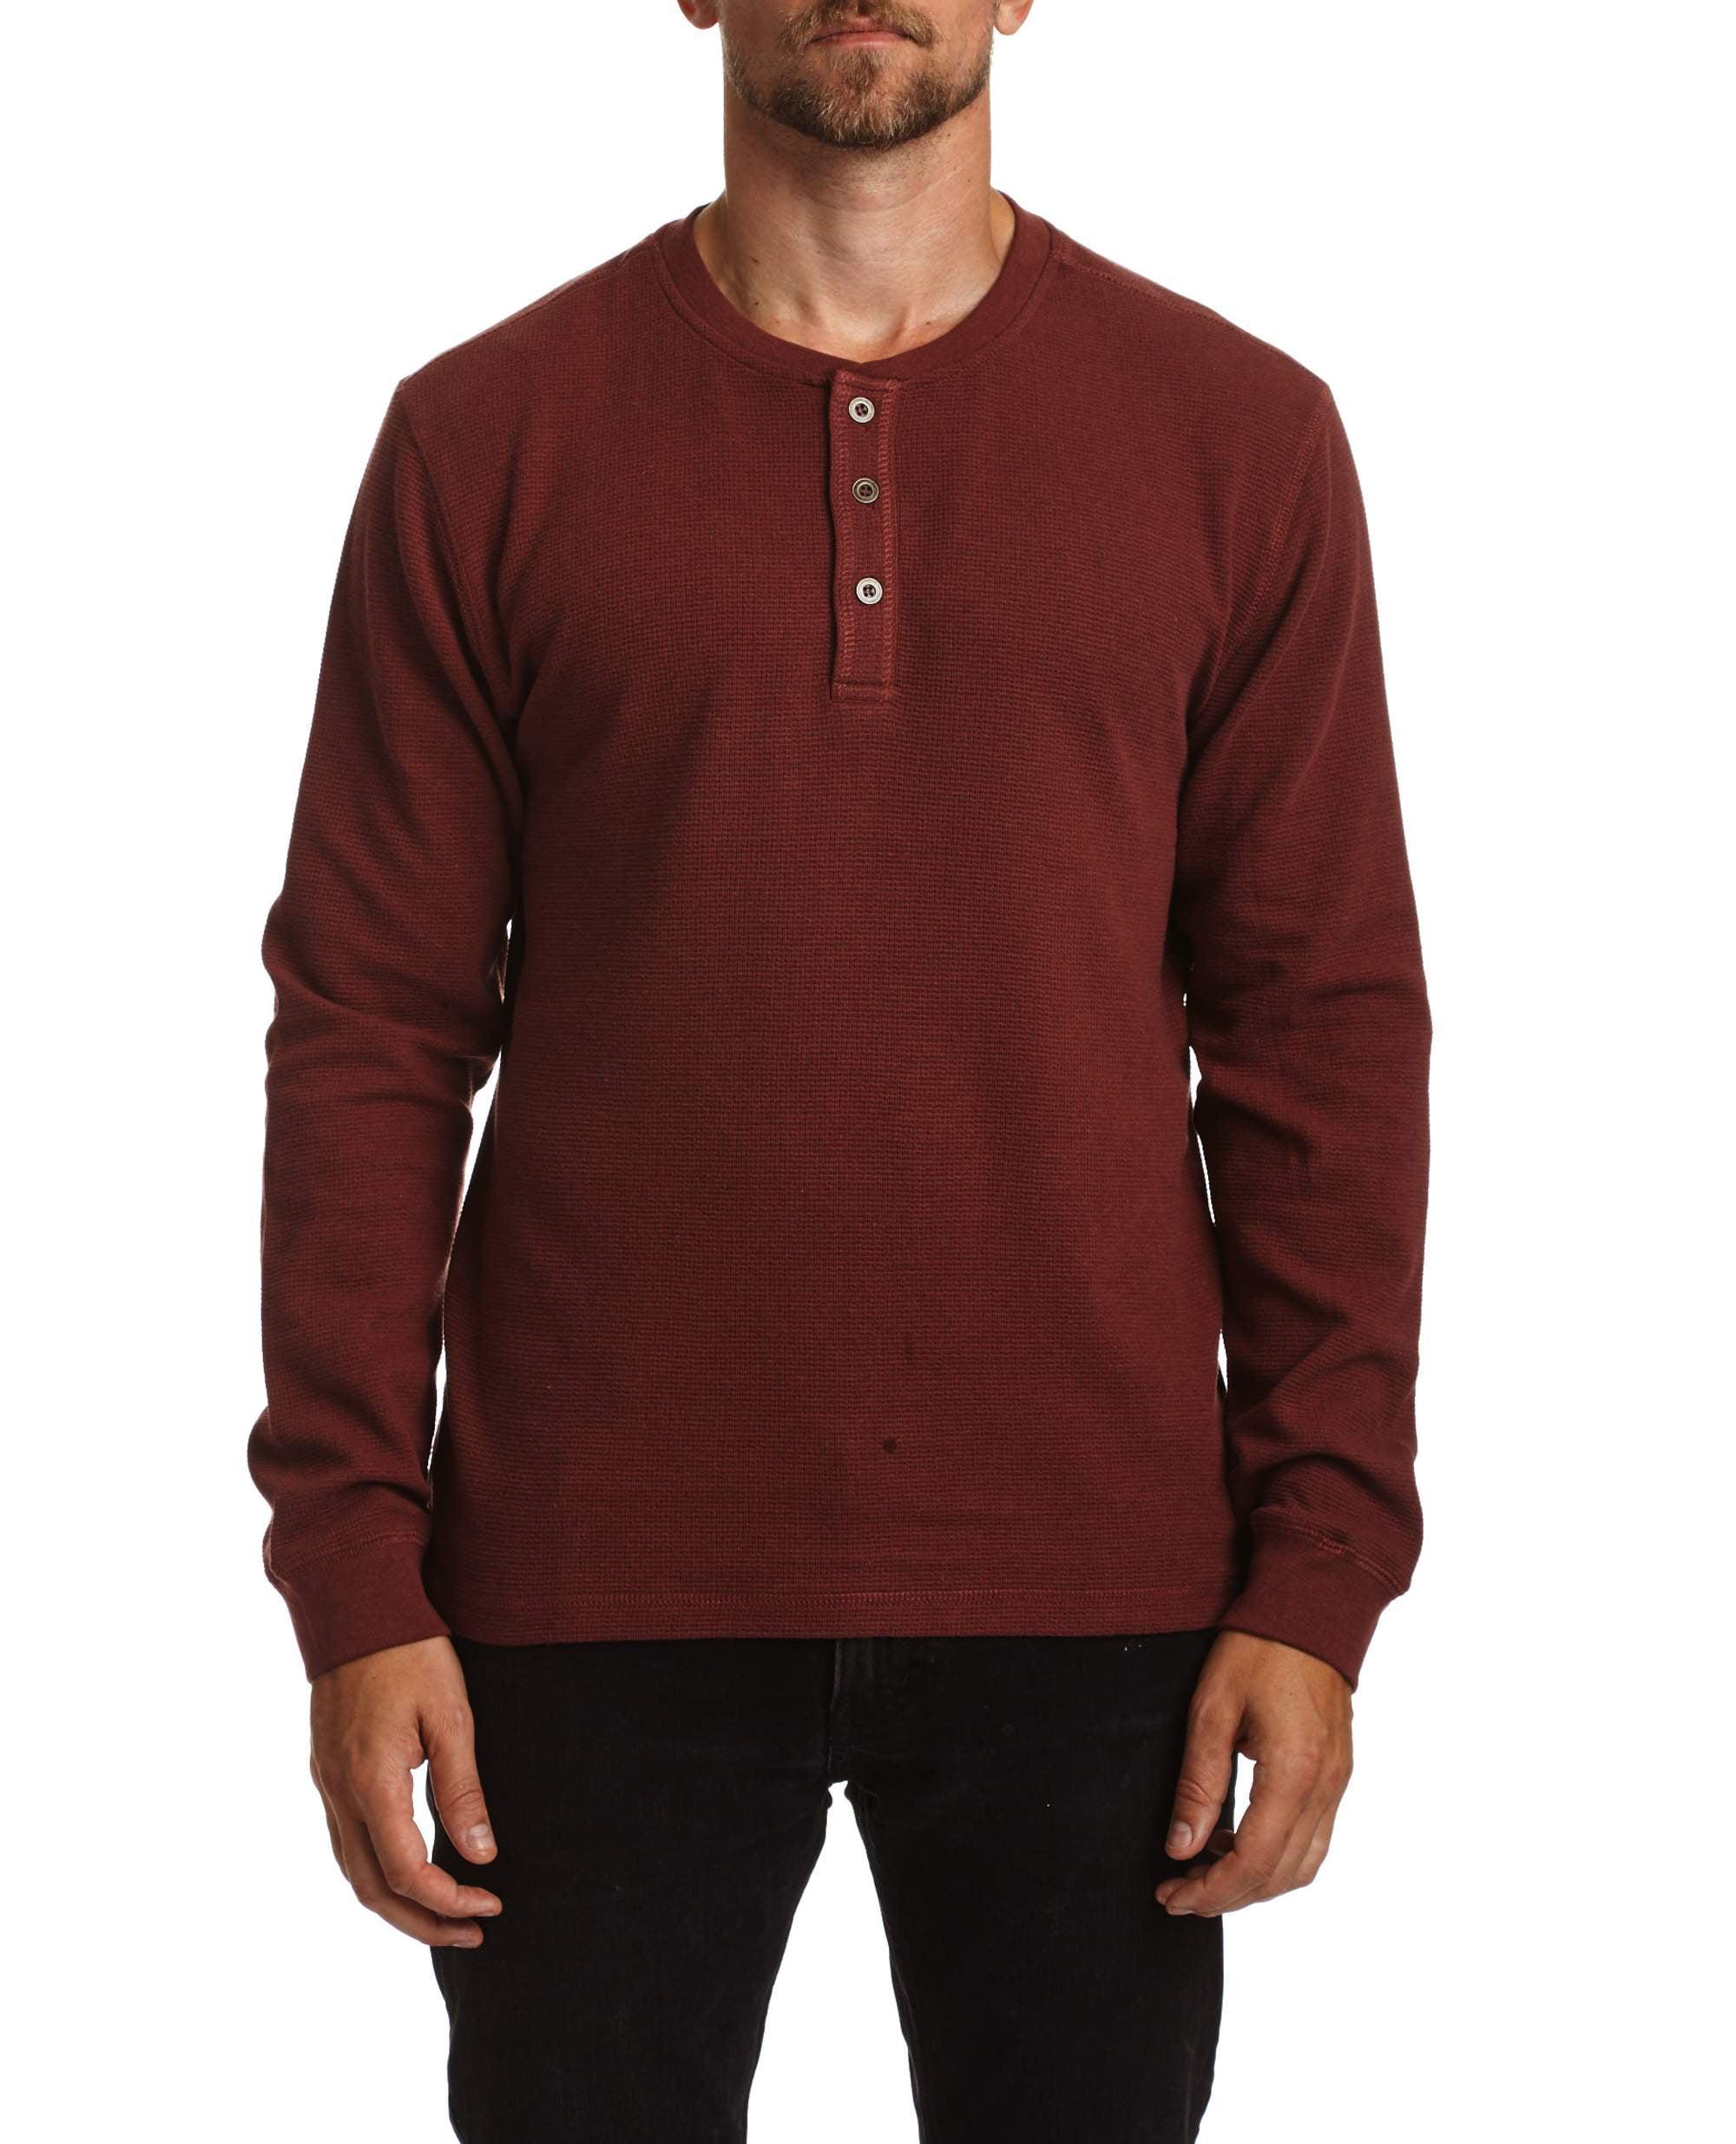 1aaf1f96856a Long Sleeve Henley Shirt Mens Walmart – DACC